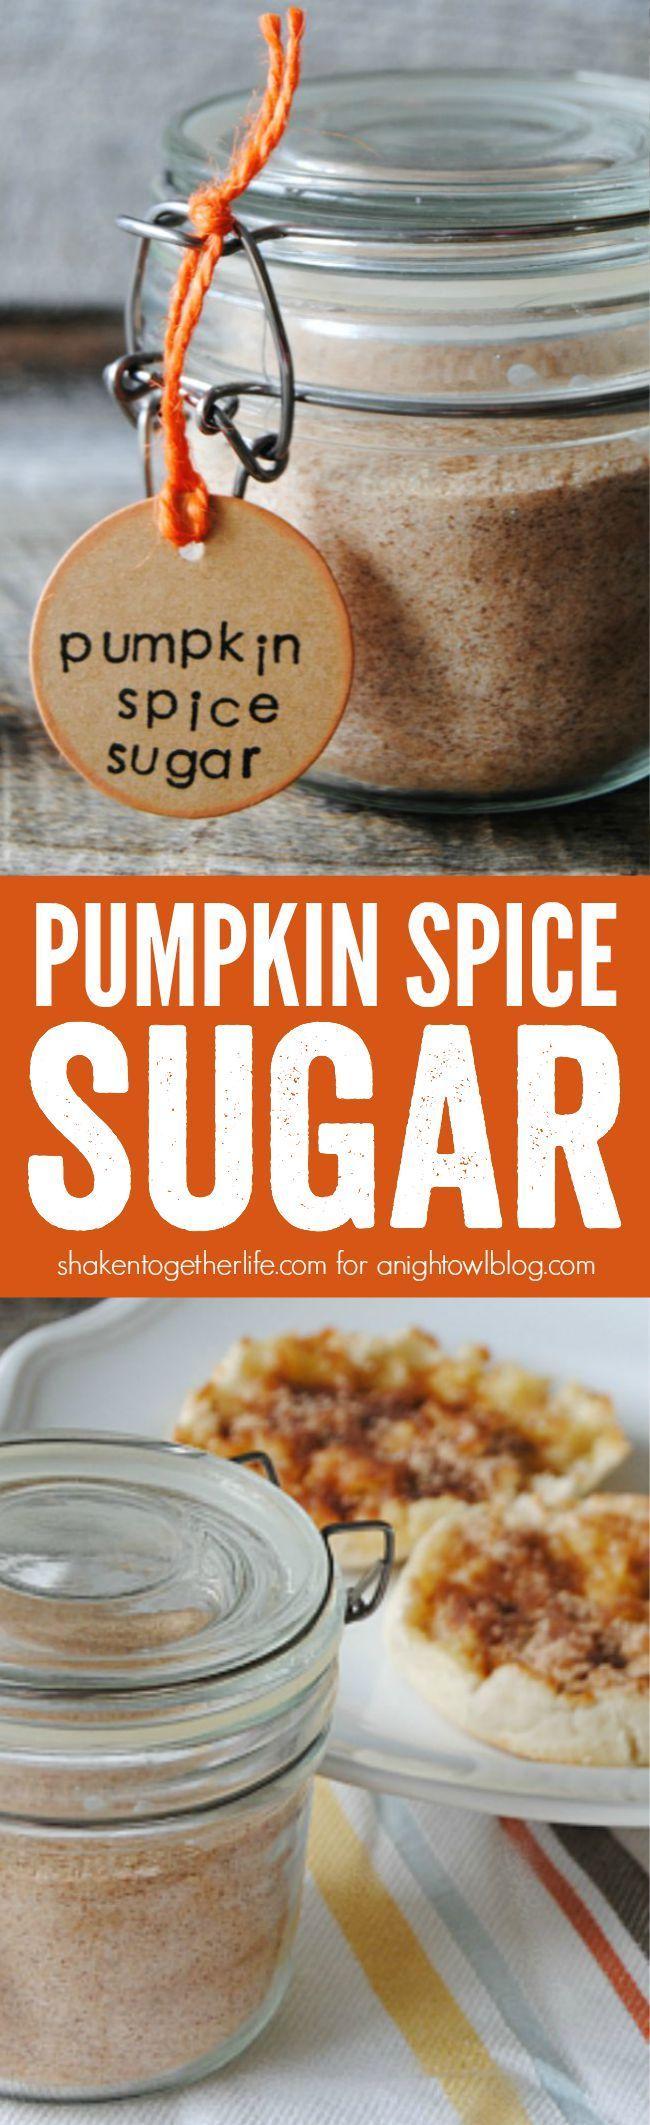 Pumpkin Spice Sugar is the taste of Fall! Sprinkle it on toast, stir it in…